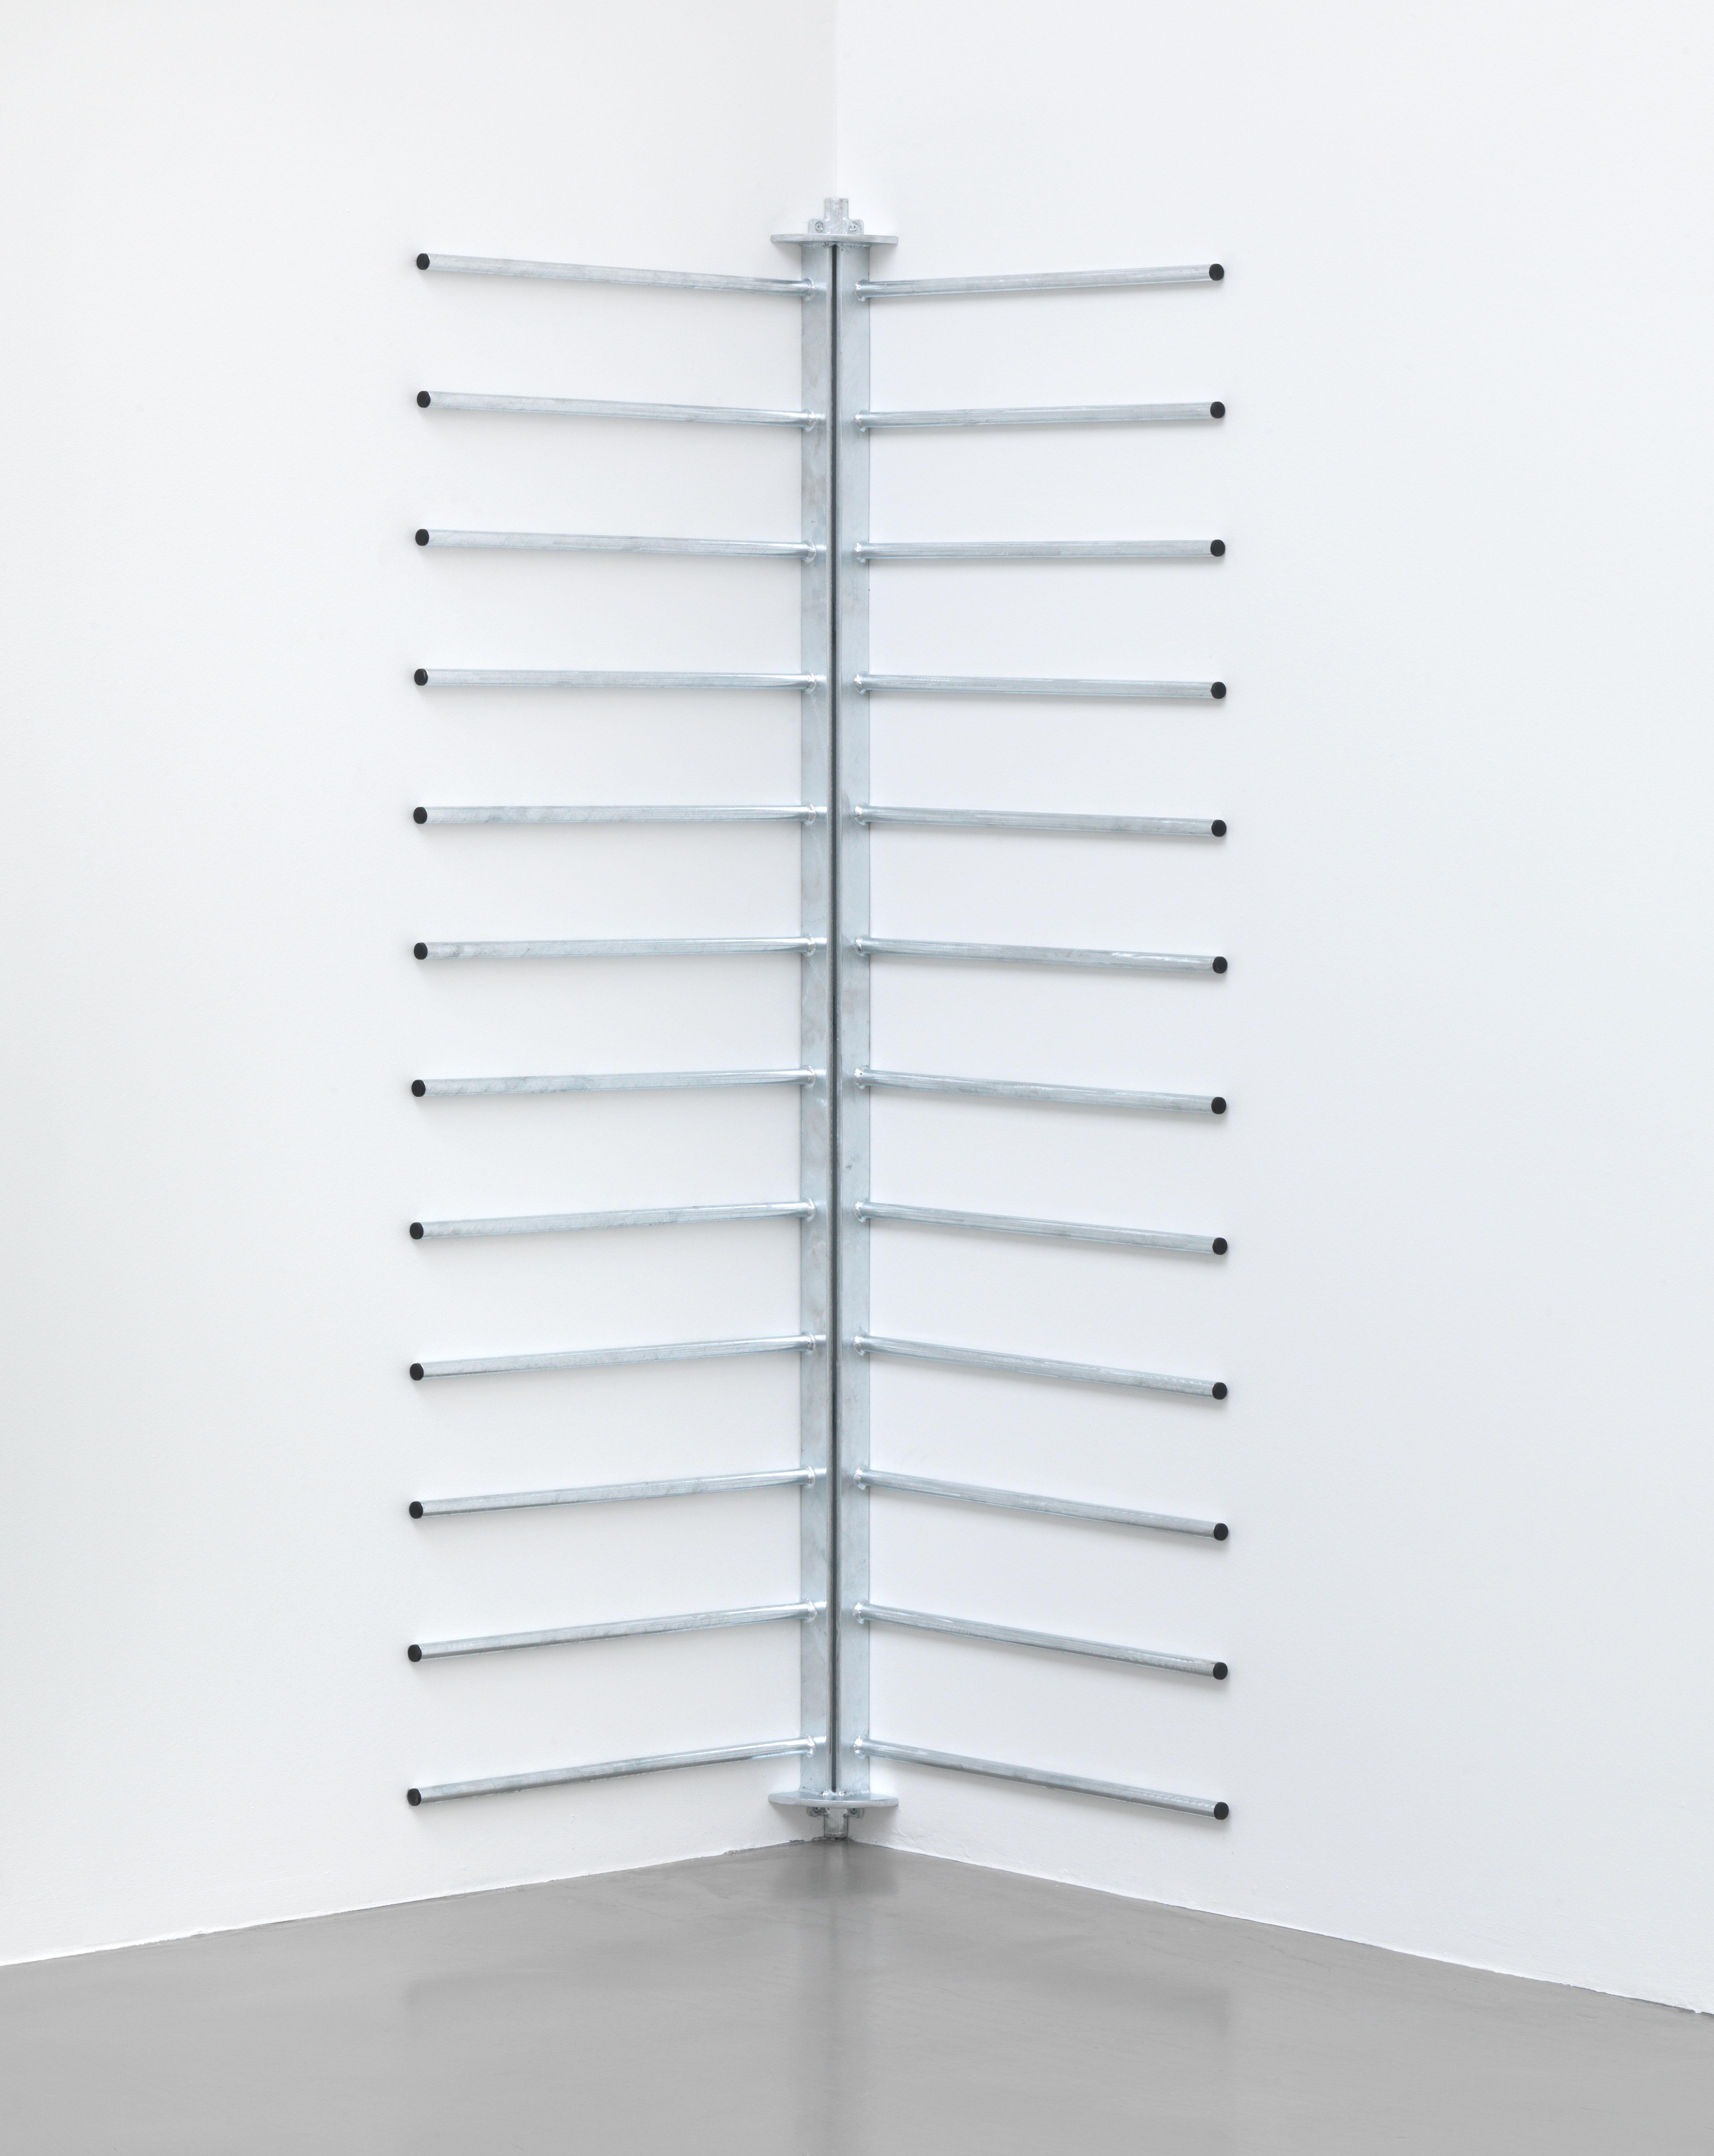 Galerie Barbara Thumm \ Jota Castro: Schengen (JCa-12-0085) \ Jota Castro (2012)